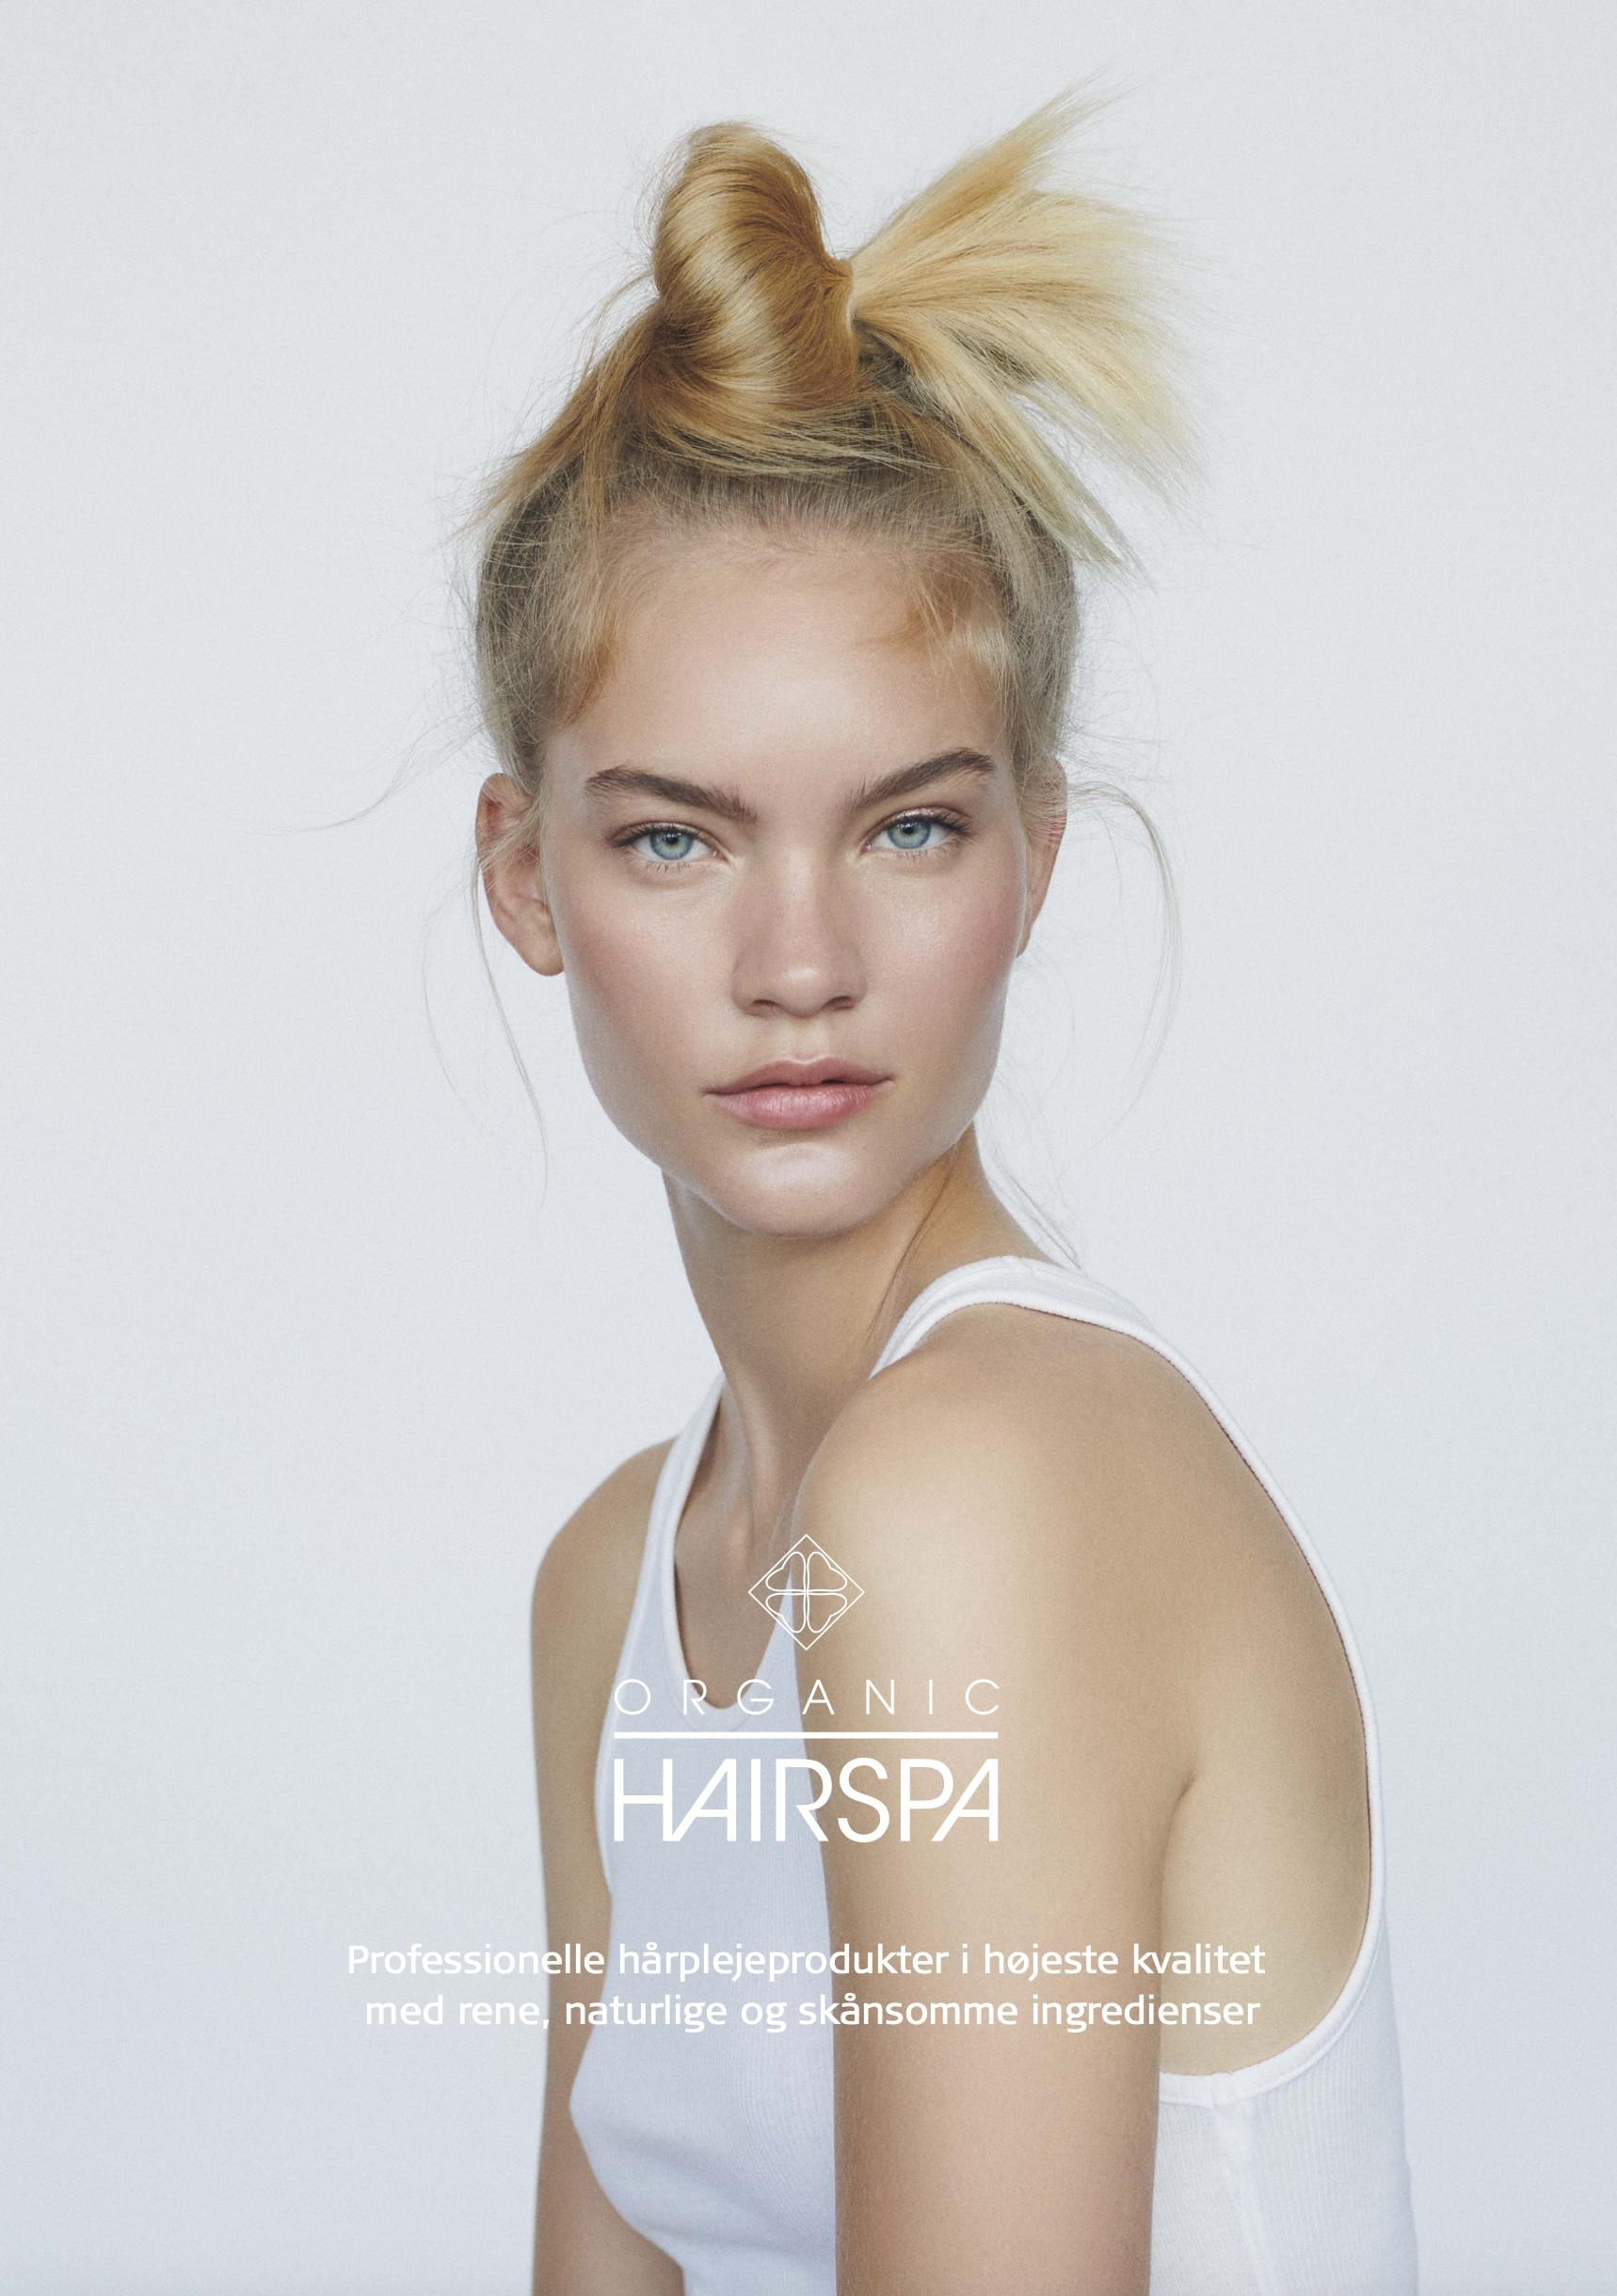 Organic Hairspa brochure artwork